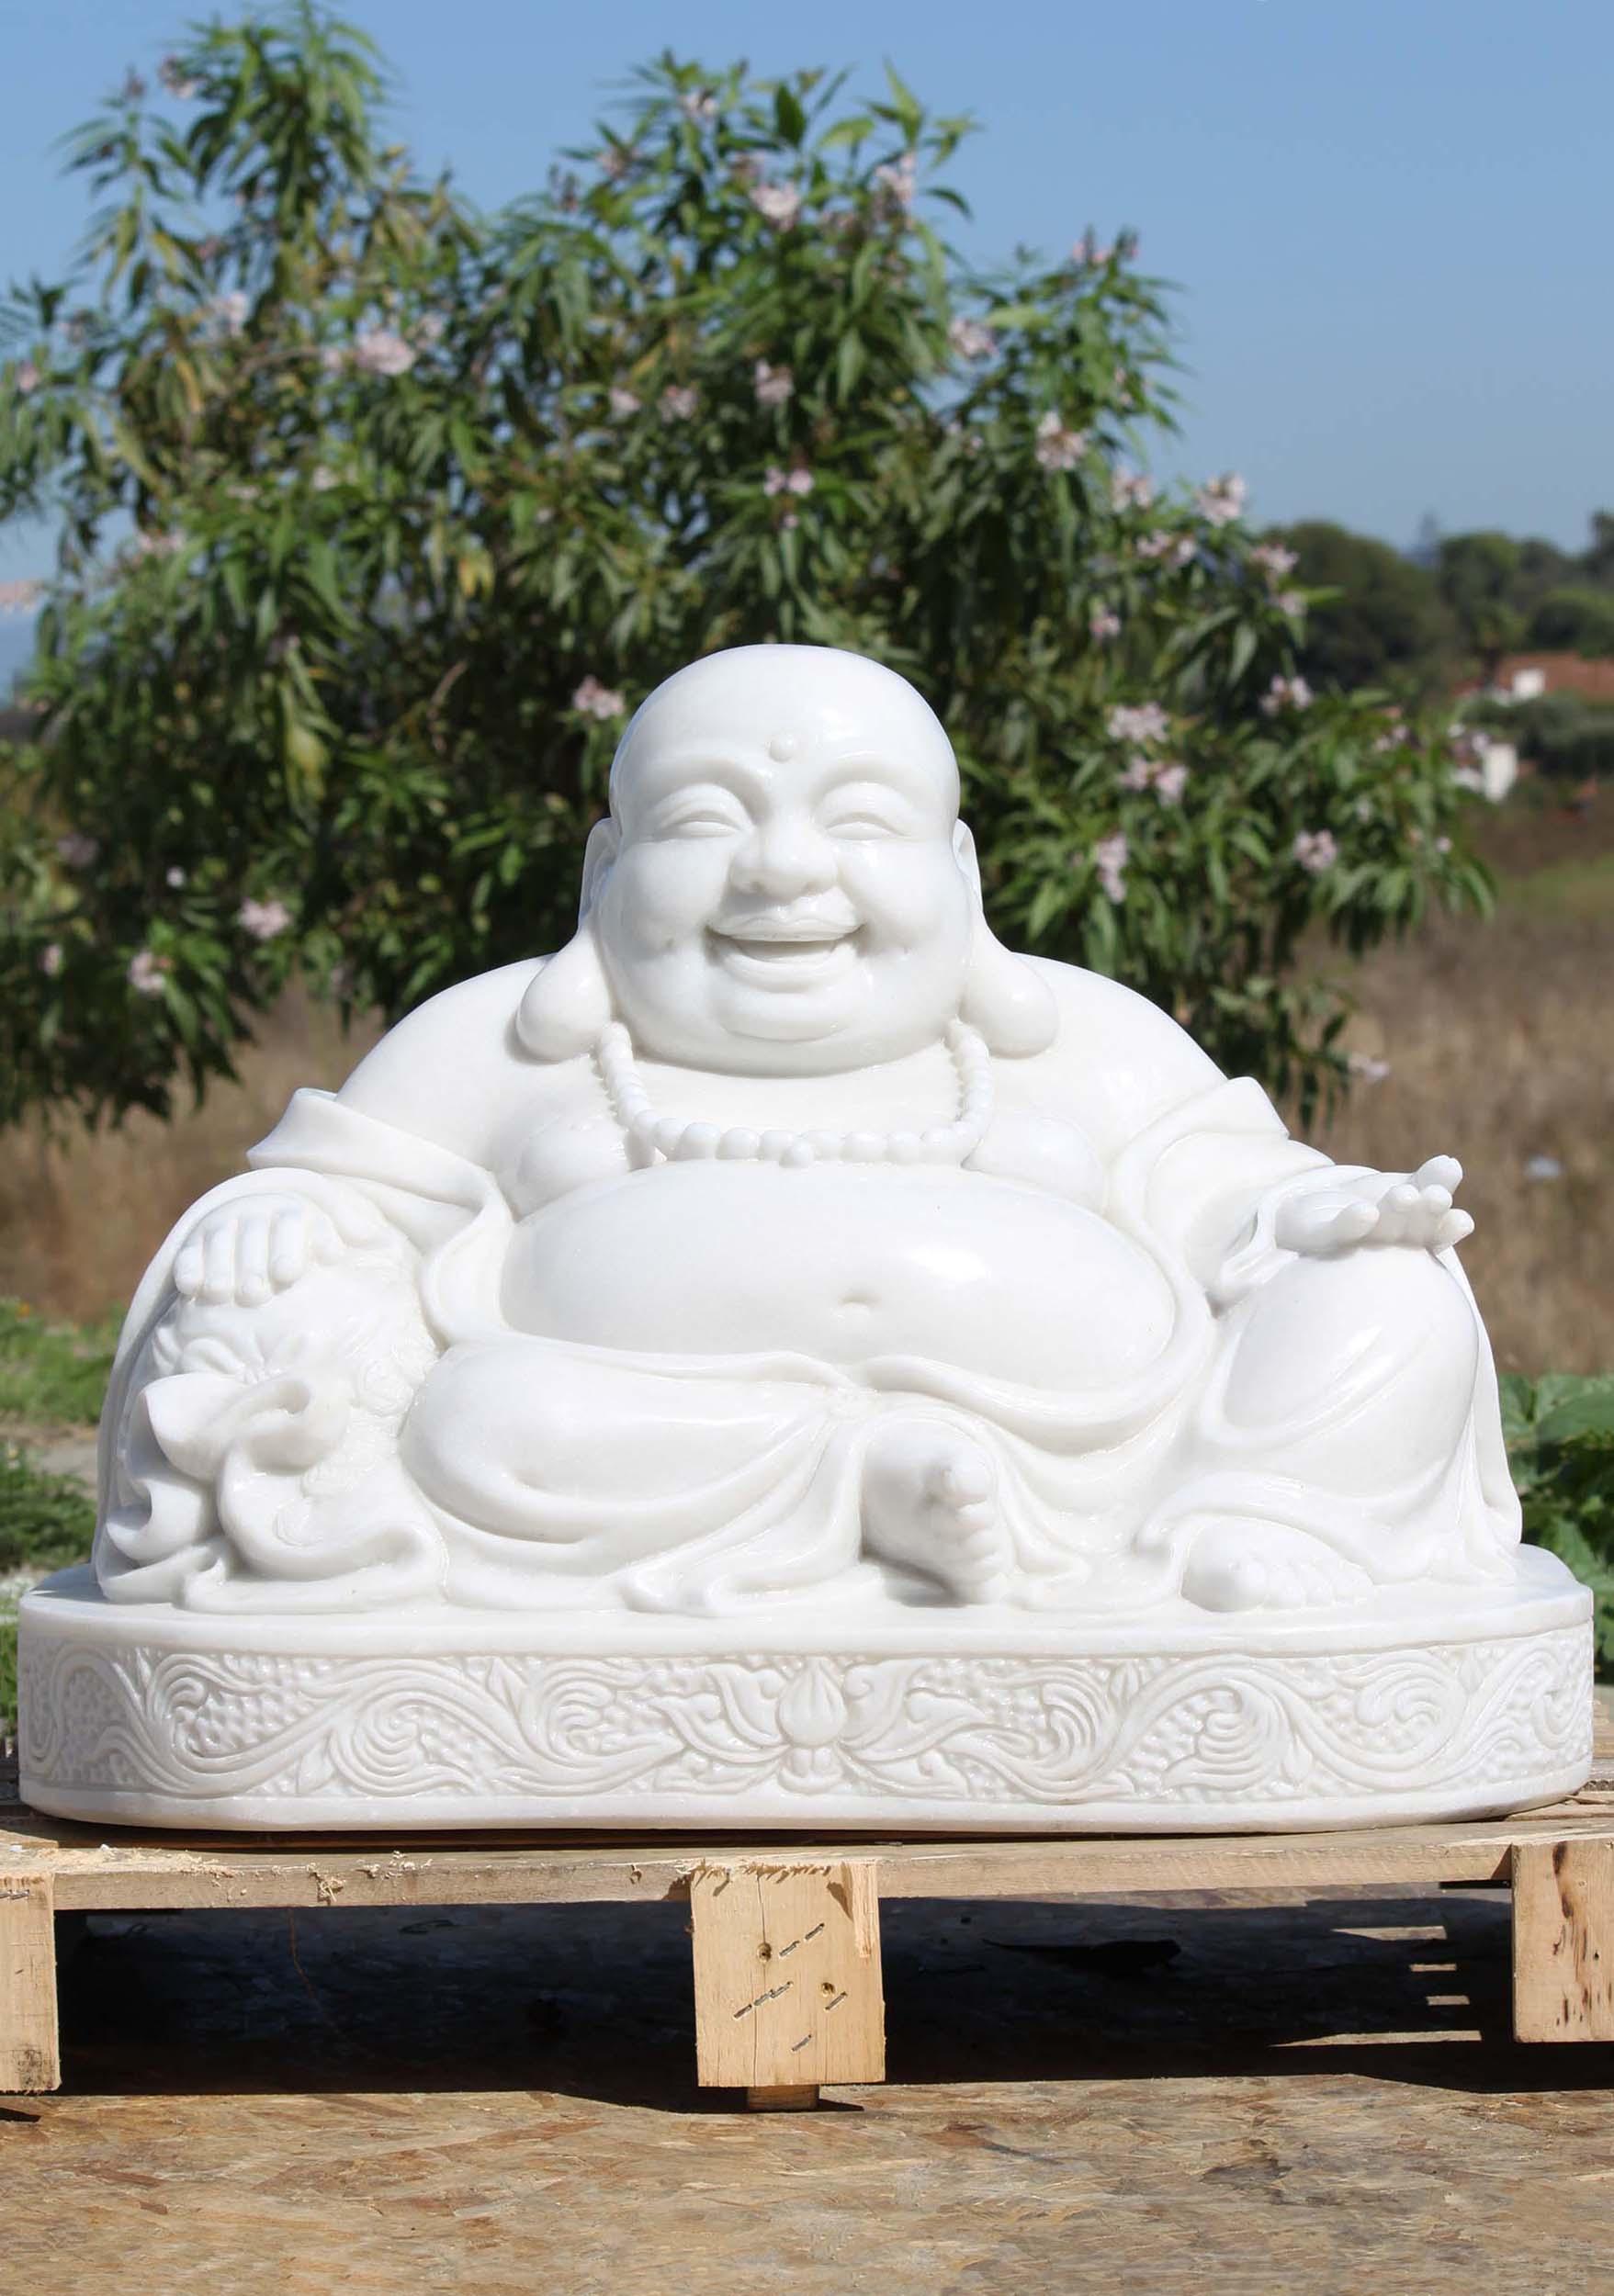 Marble Fat Buddha Of Prosperity Garden Statue 20 117wm100 Hindu Gods Buddha Statues